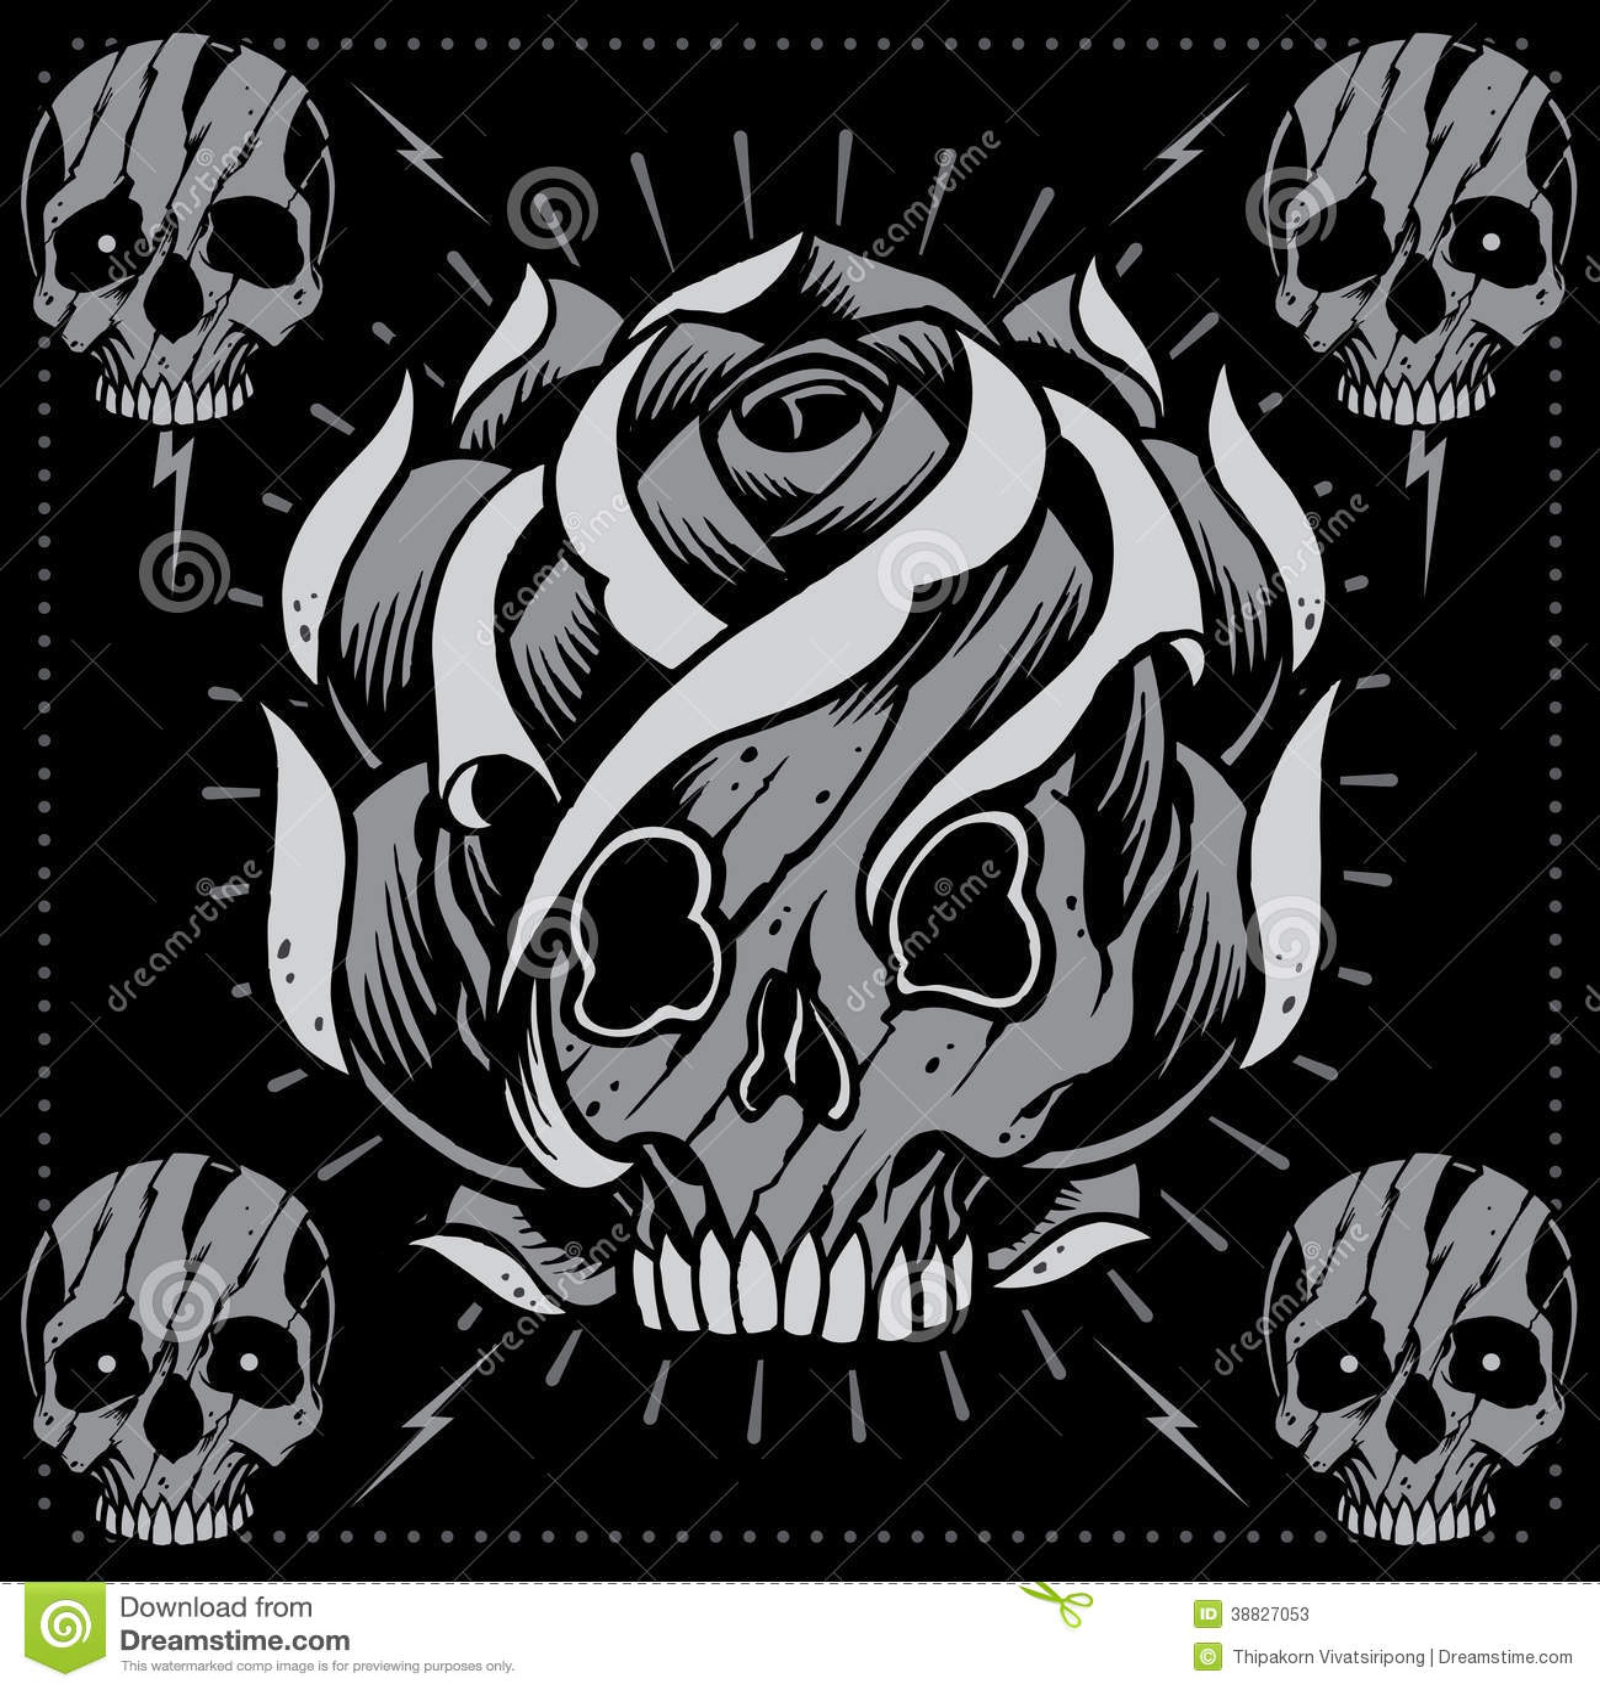 Skulls And Skull Rose Shape Vector Stock  Image 38827053